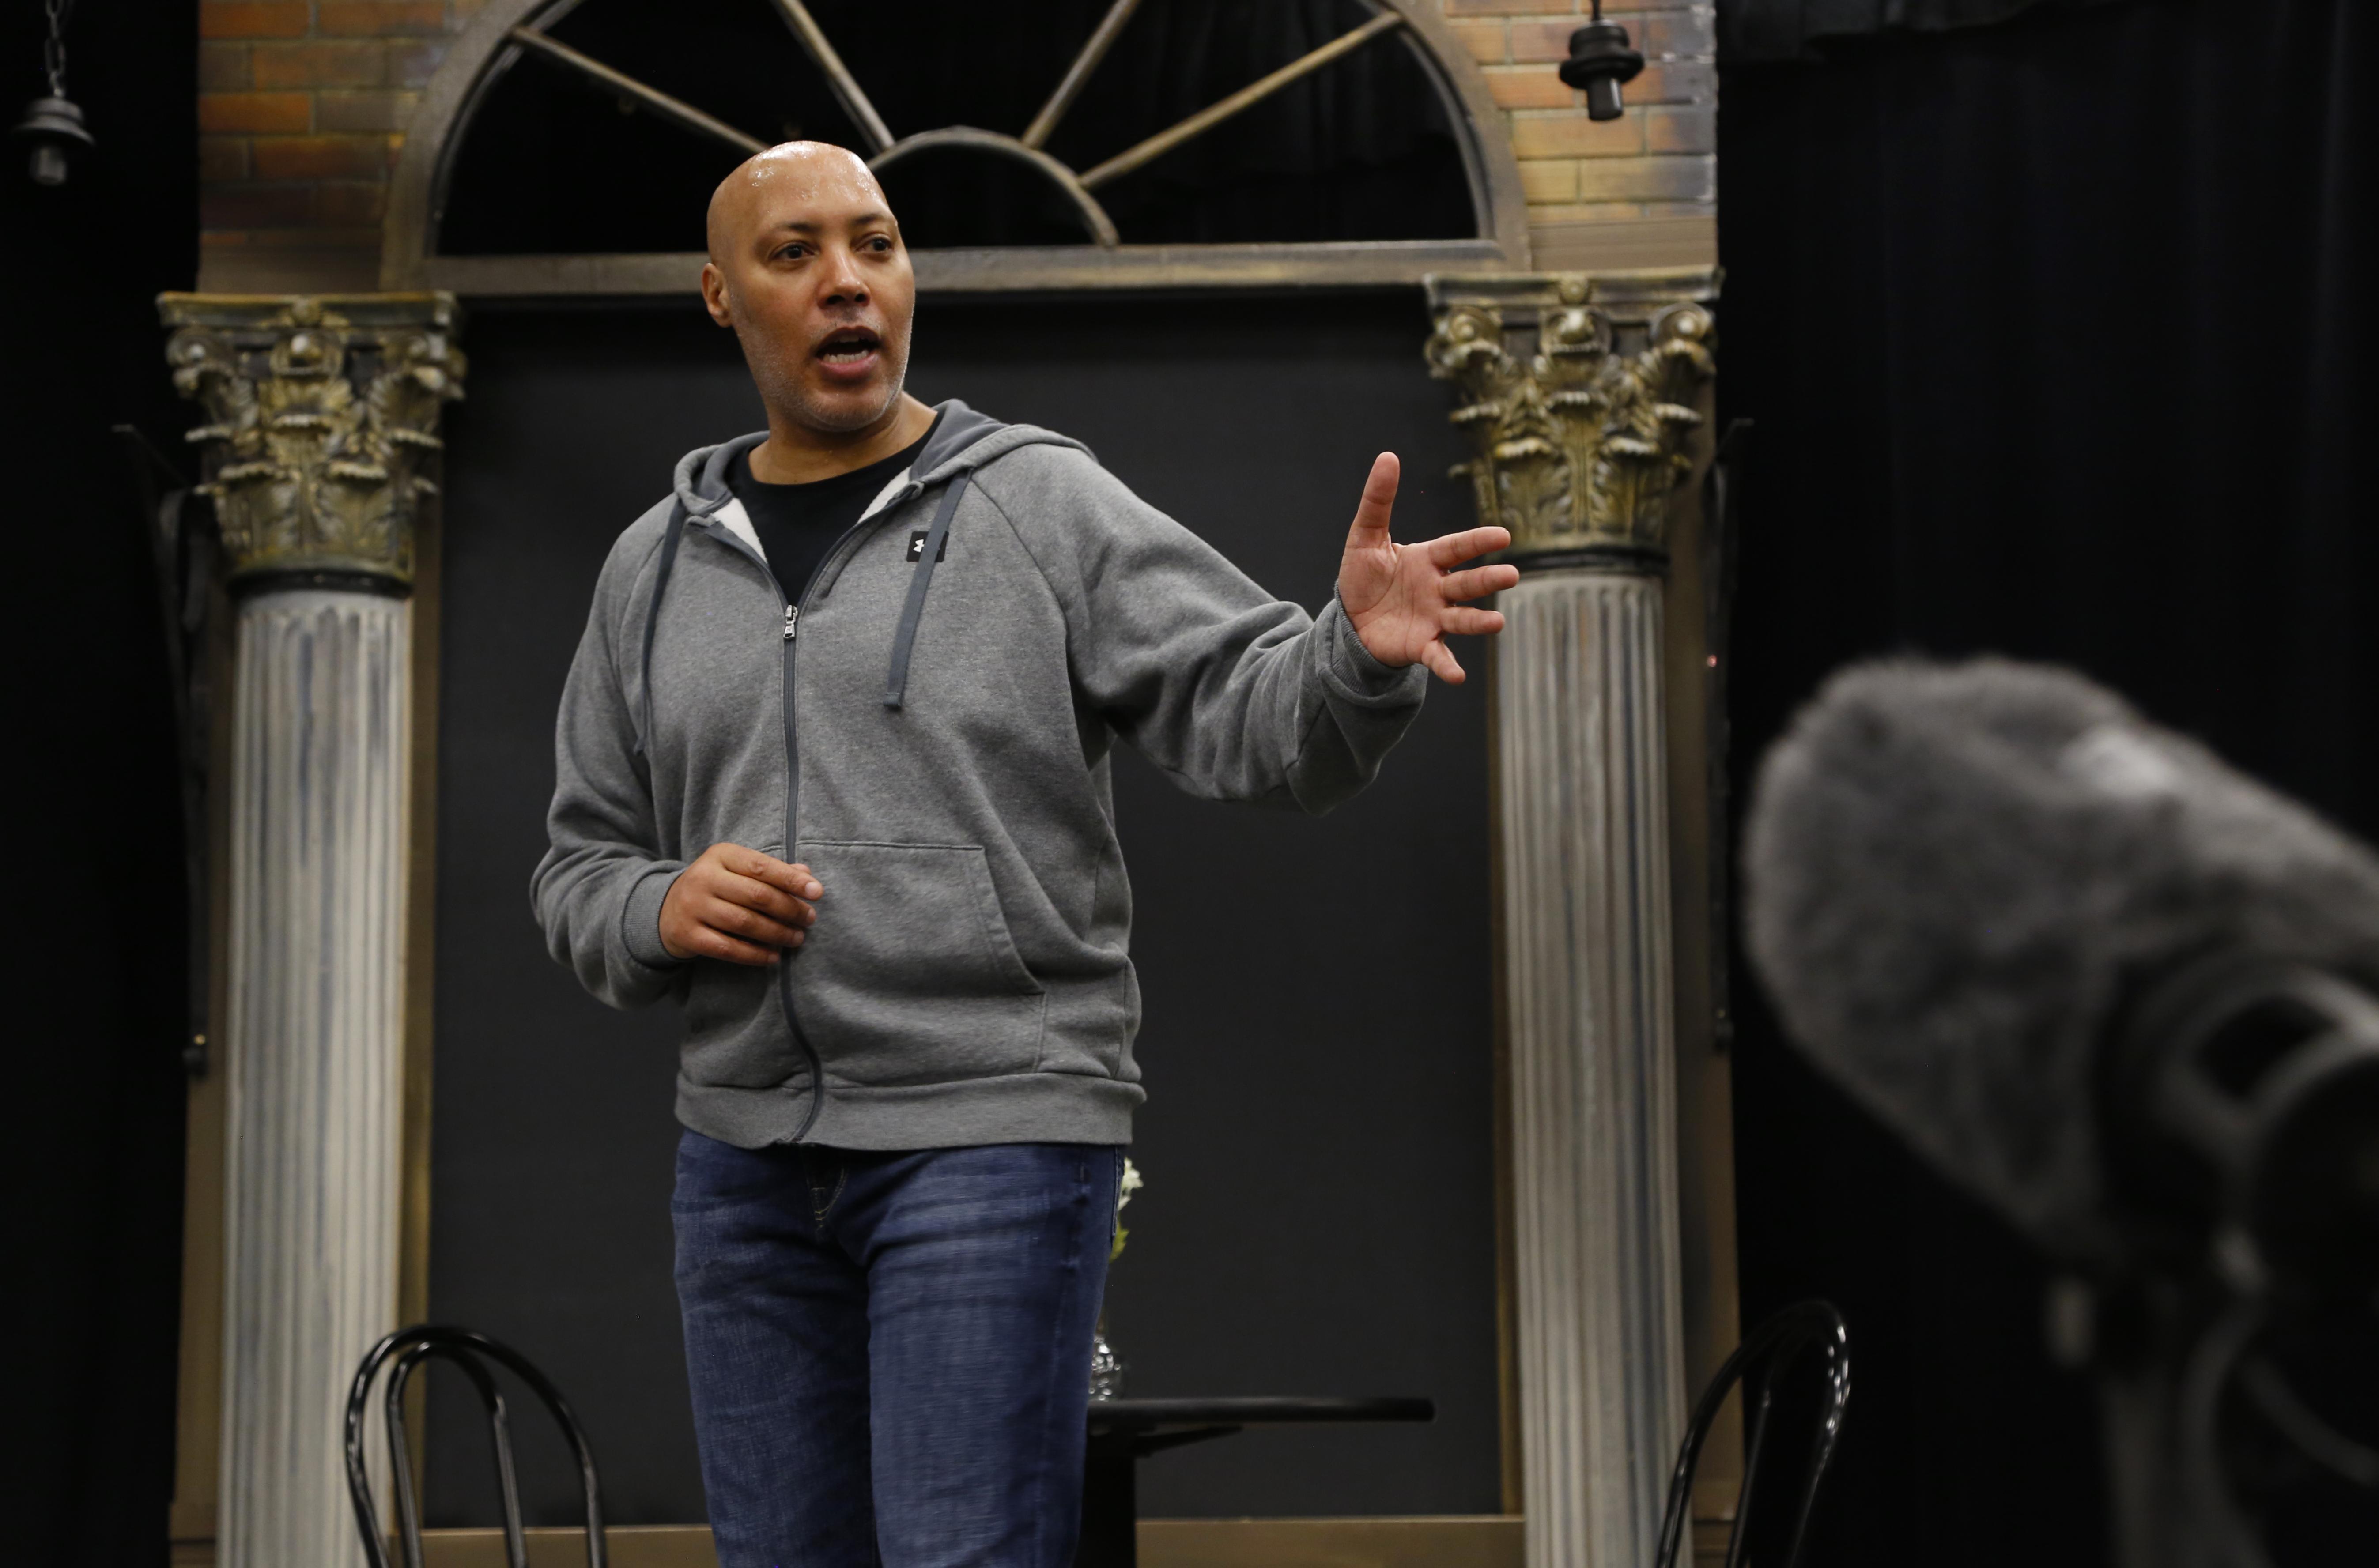 Timothy Christie of Moncton plays Walker. (Maria Jose Burgos/CBC)